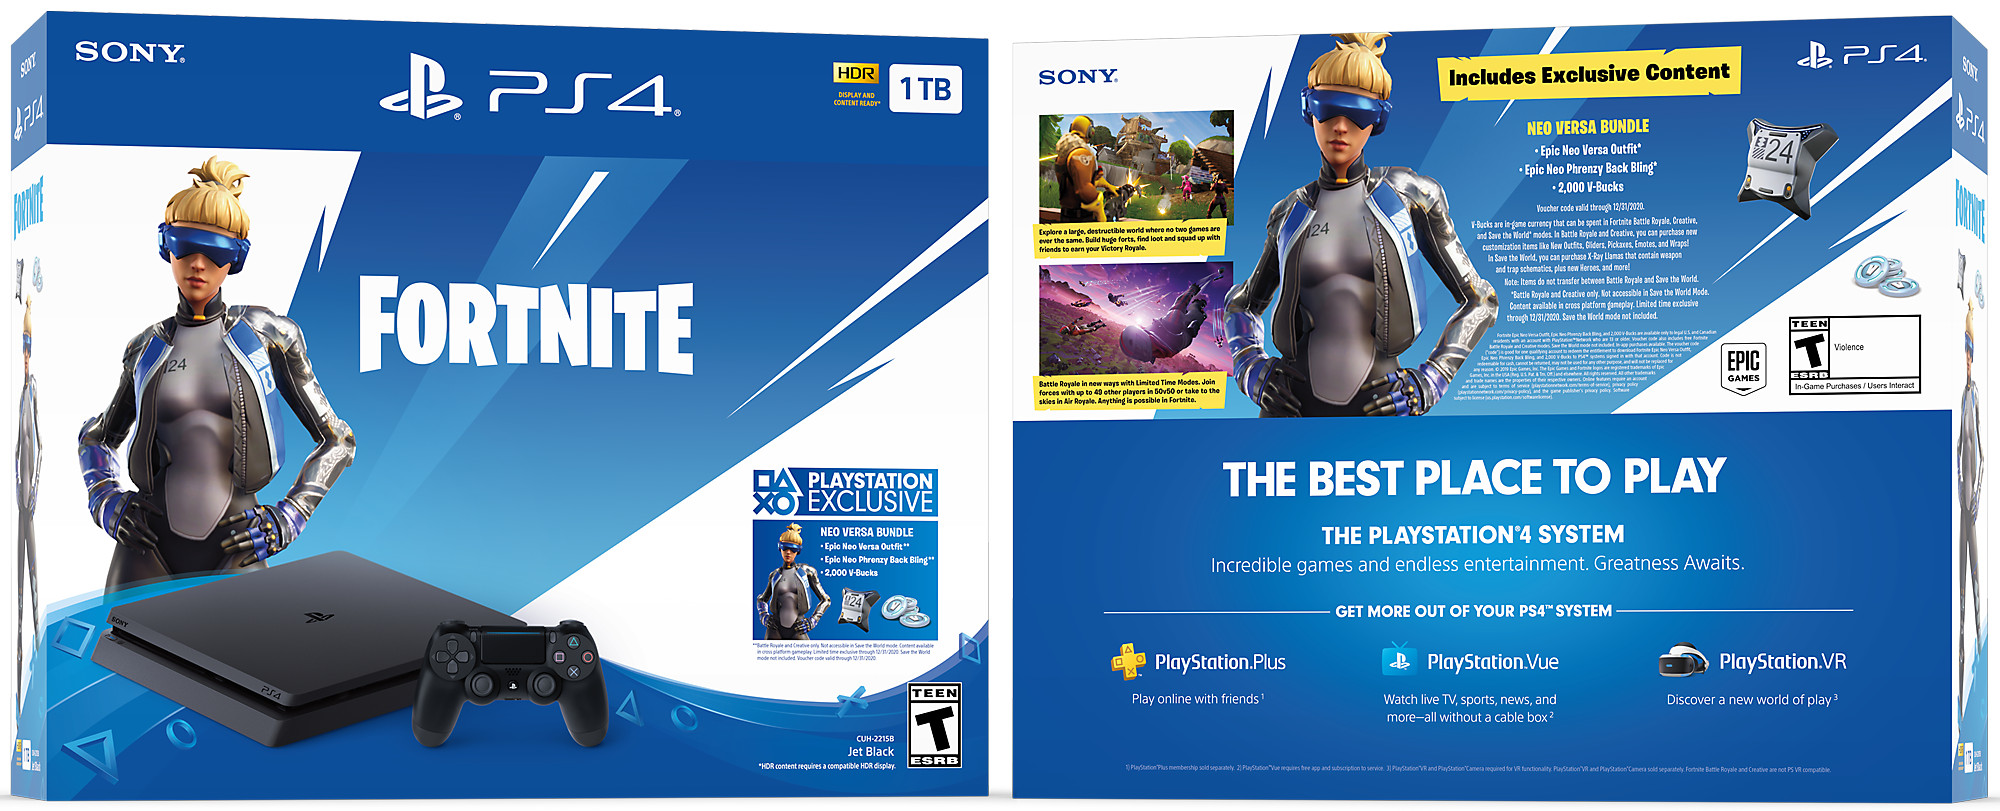 Fortnite Neo Versa Playstation4 Bundle Ps4 Playstation